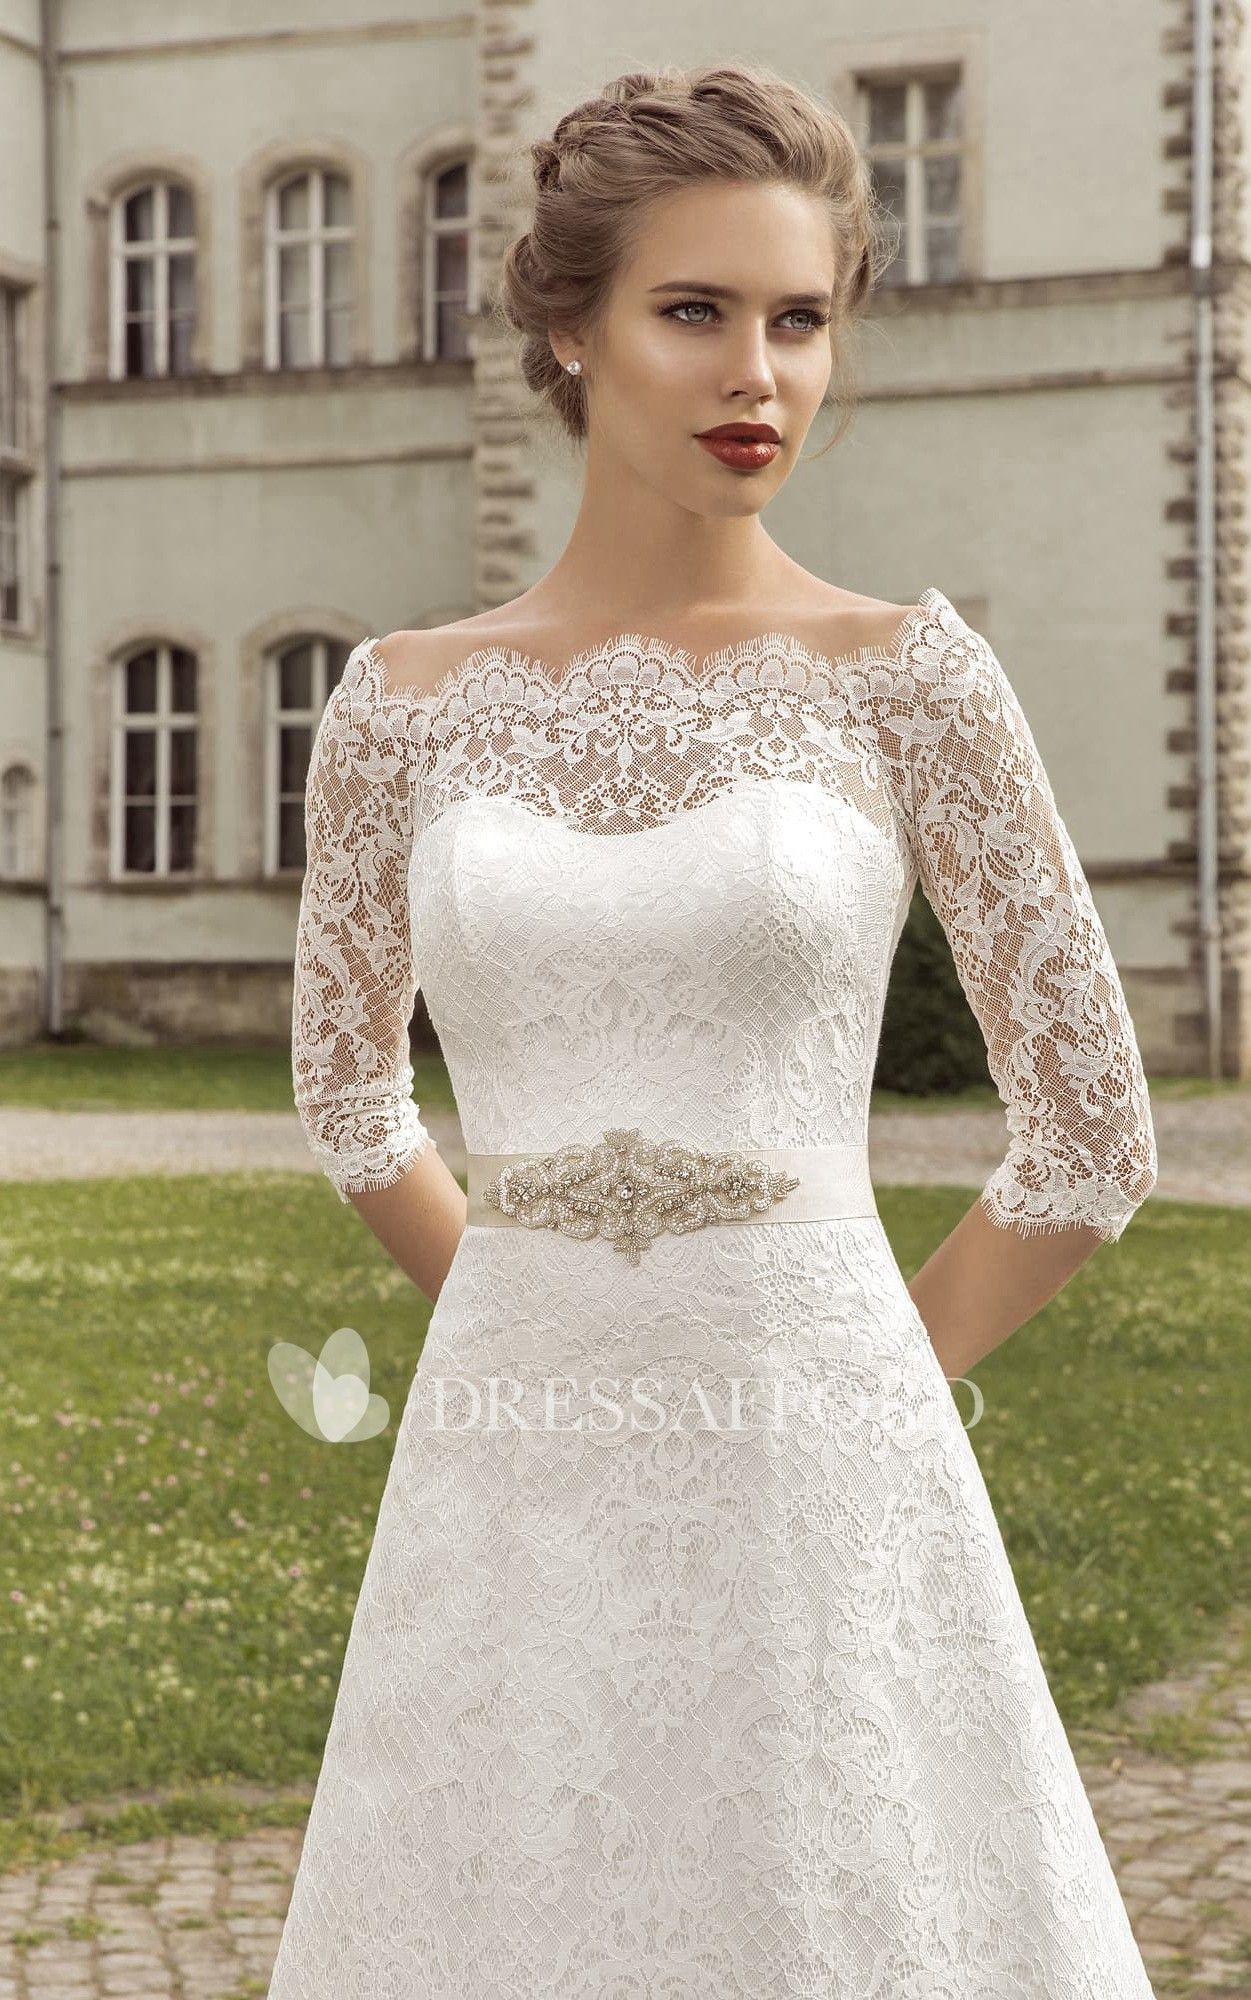 Aline crystal shortsleeve scallopedneck dress dress